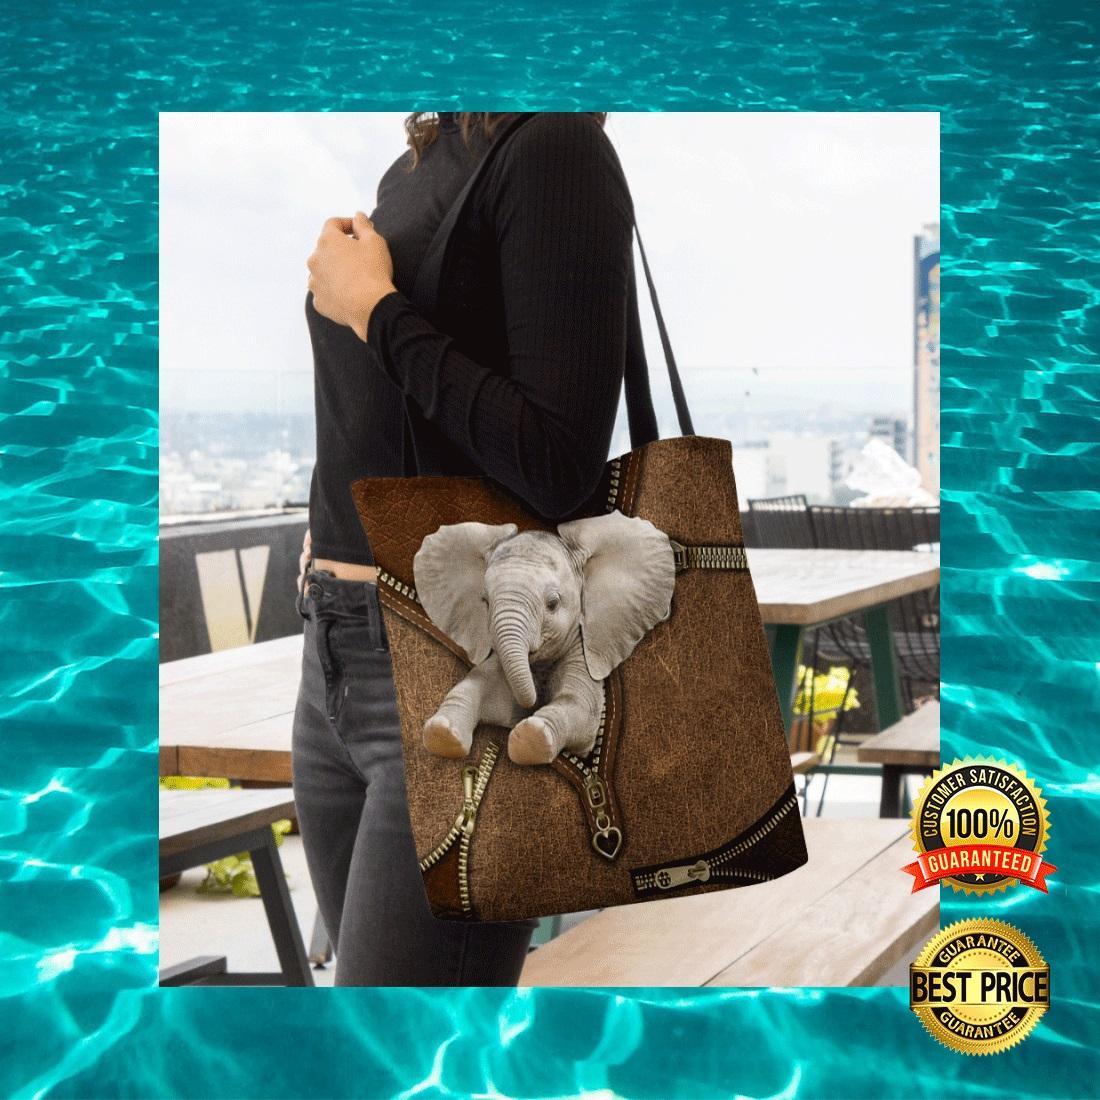 ELEPHANT ZIPPER TOTE BAG 6